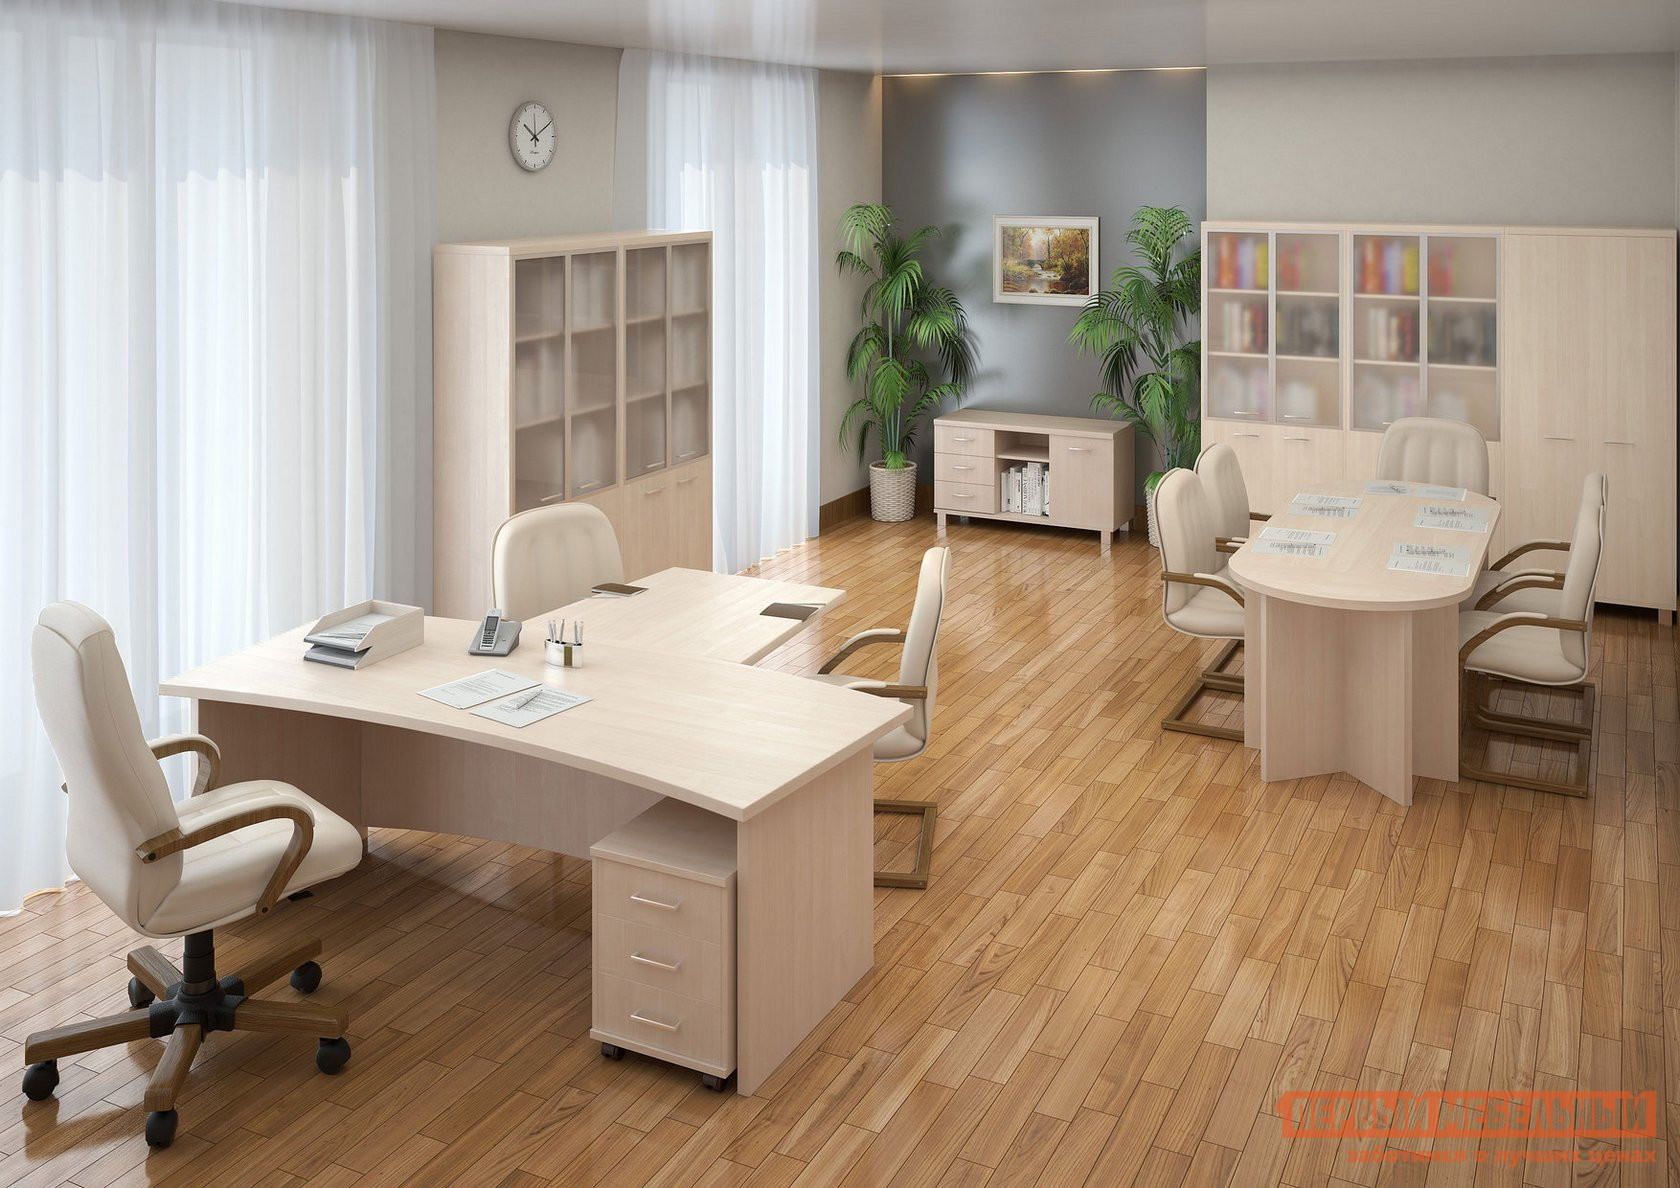 Комплект офисной мебели Riva Фёст Клен К1 комплект детской мебели мебельсон колледж к1